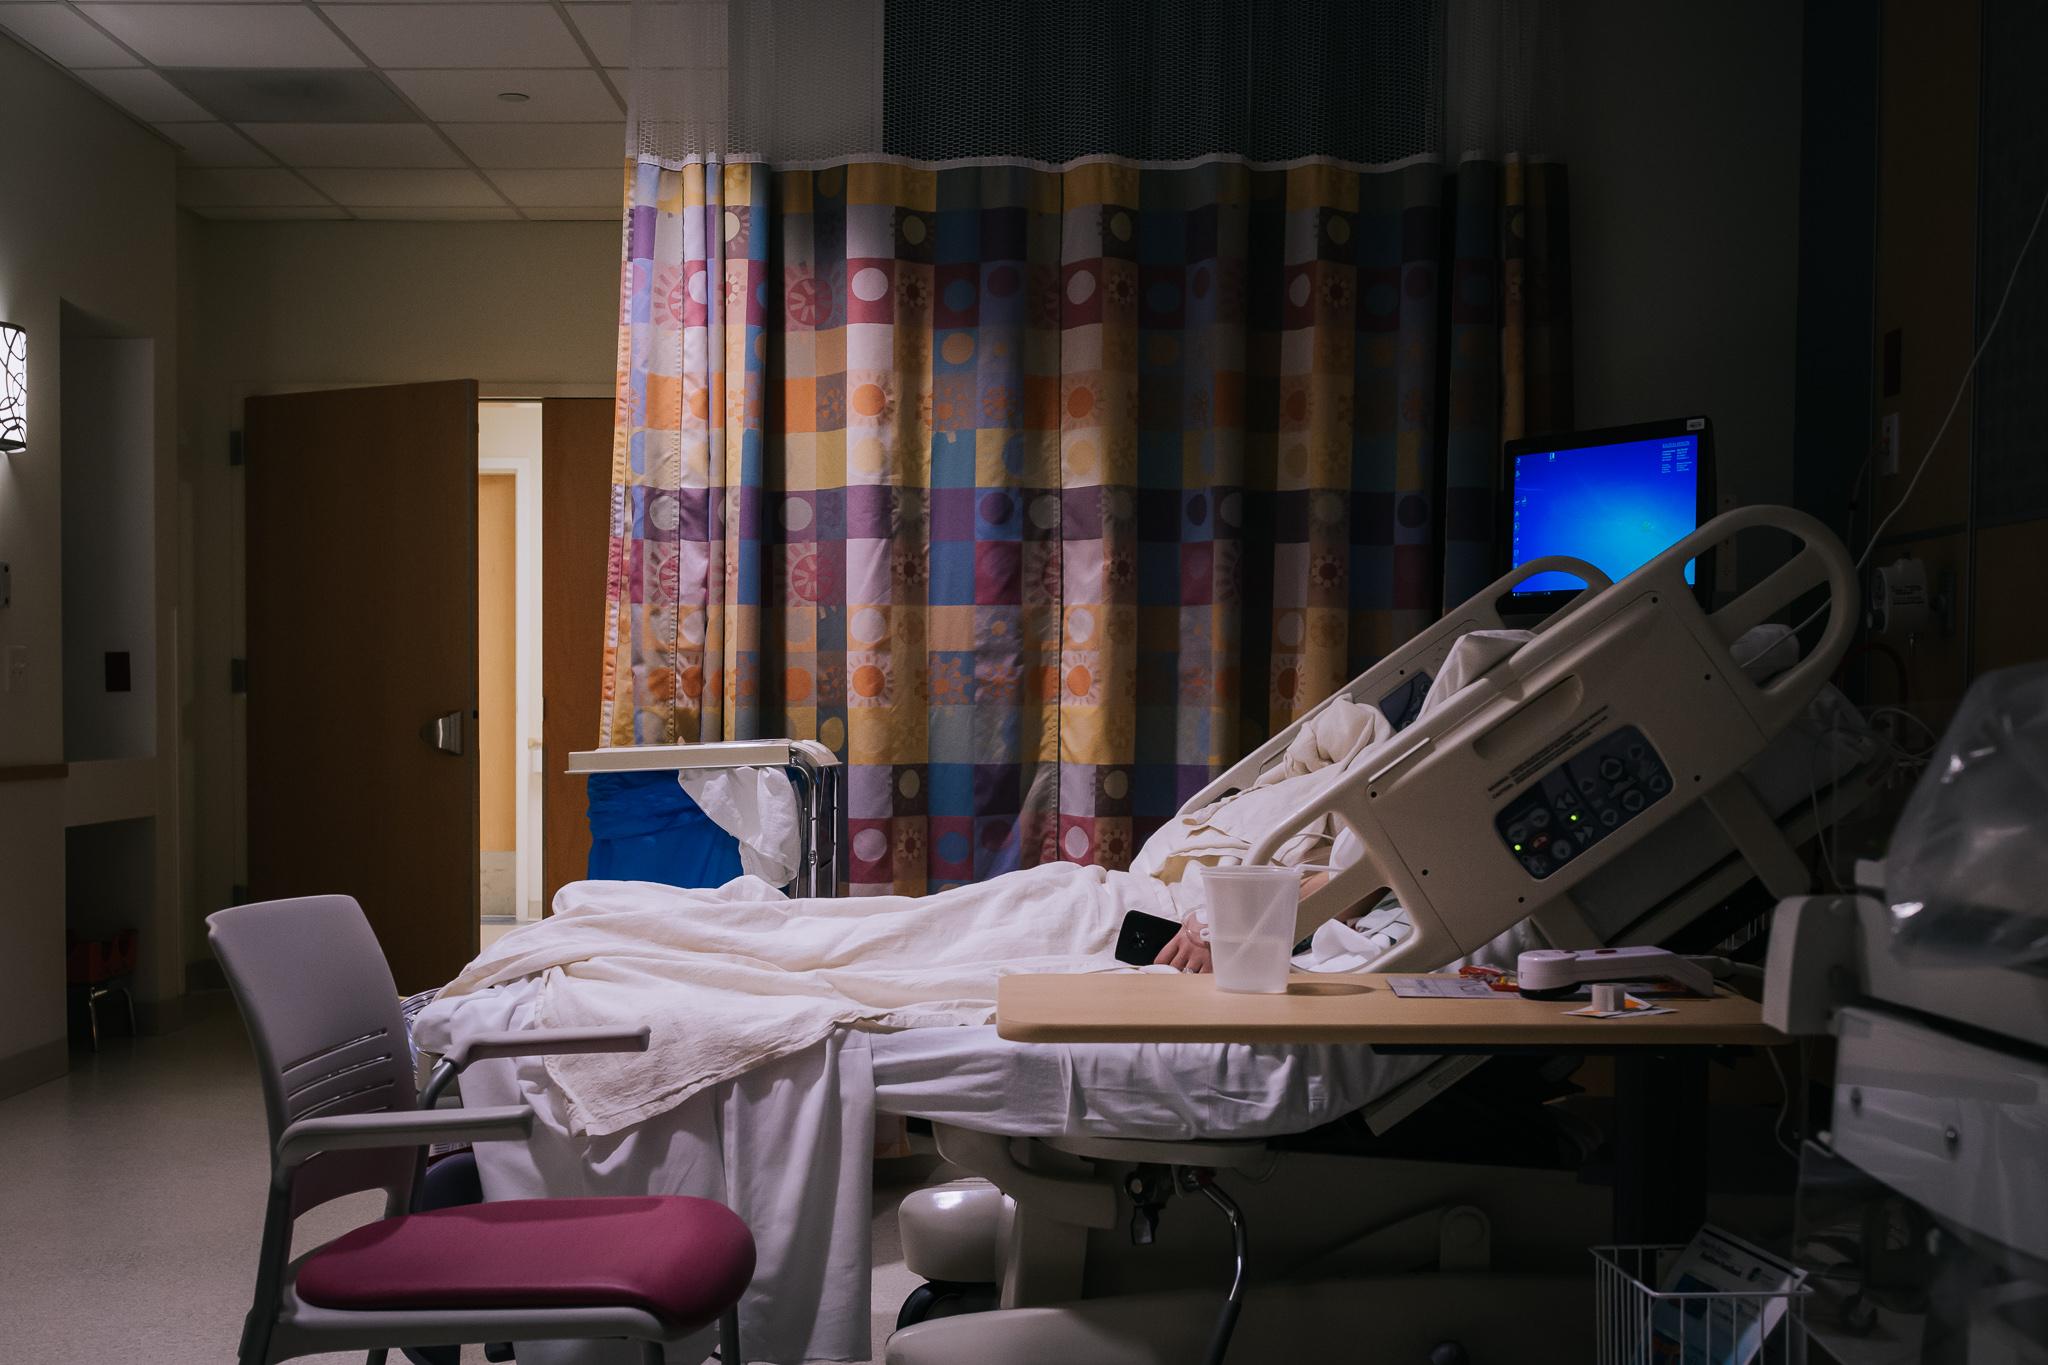 A mom sleeps after surgery.